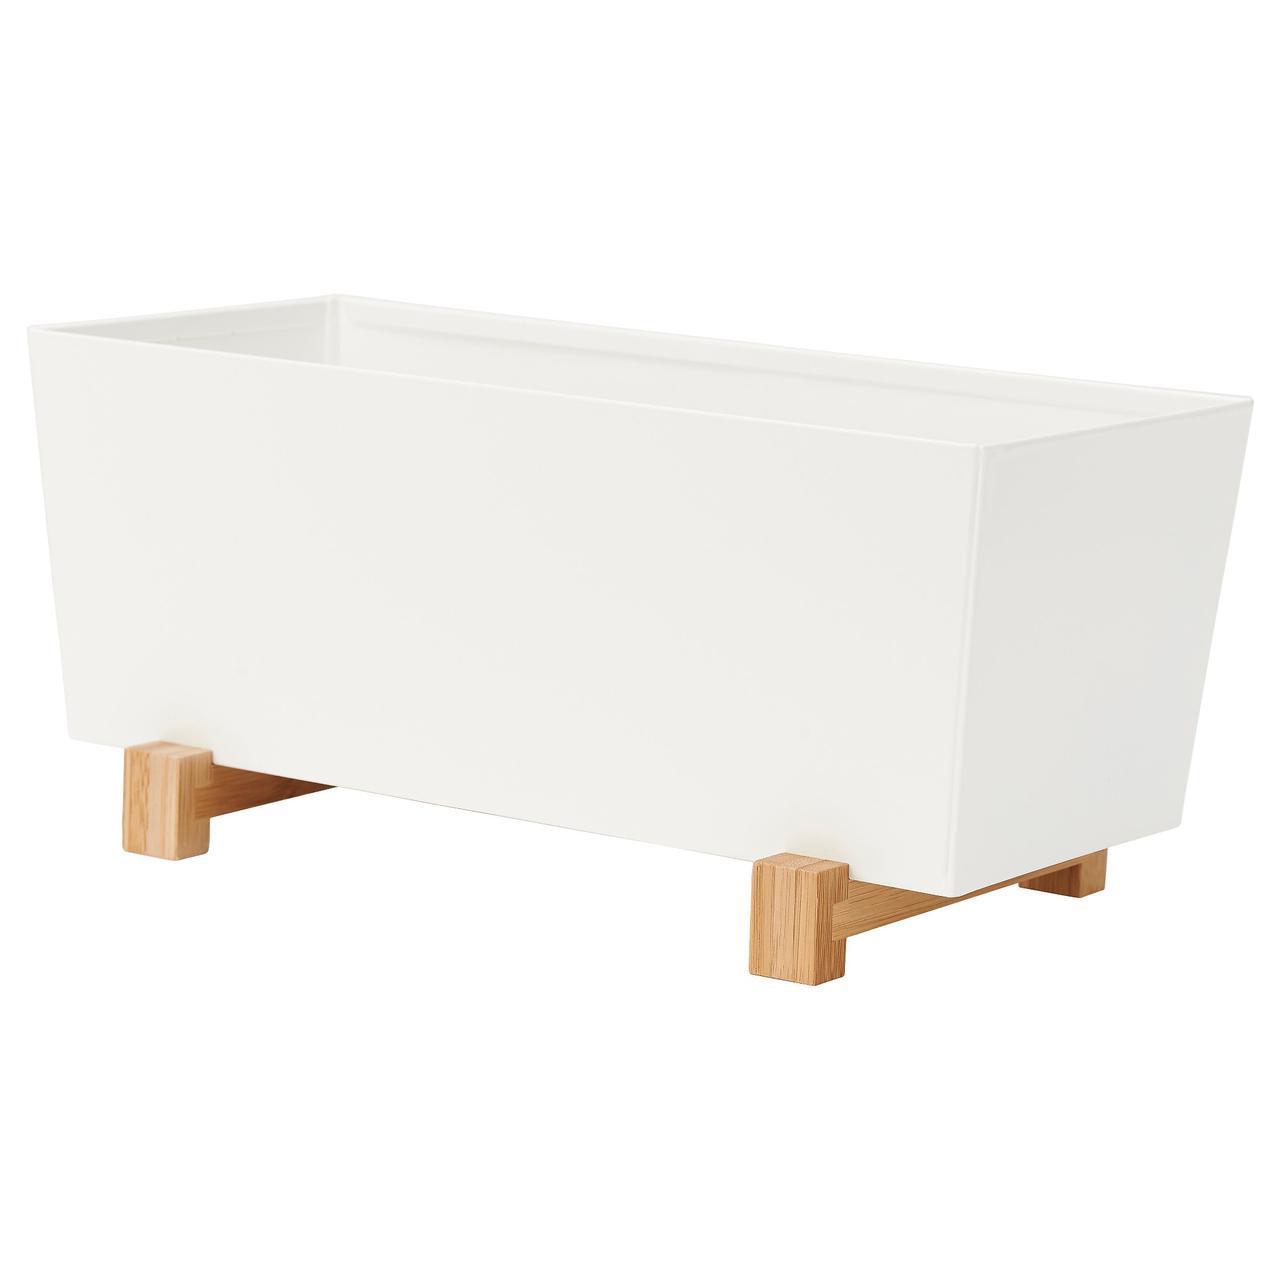 IKEA BITTERGURKA (802.857.87) Обложка гошка, белый